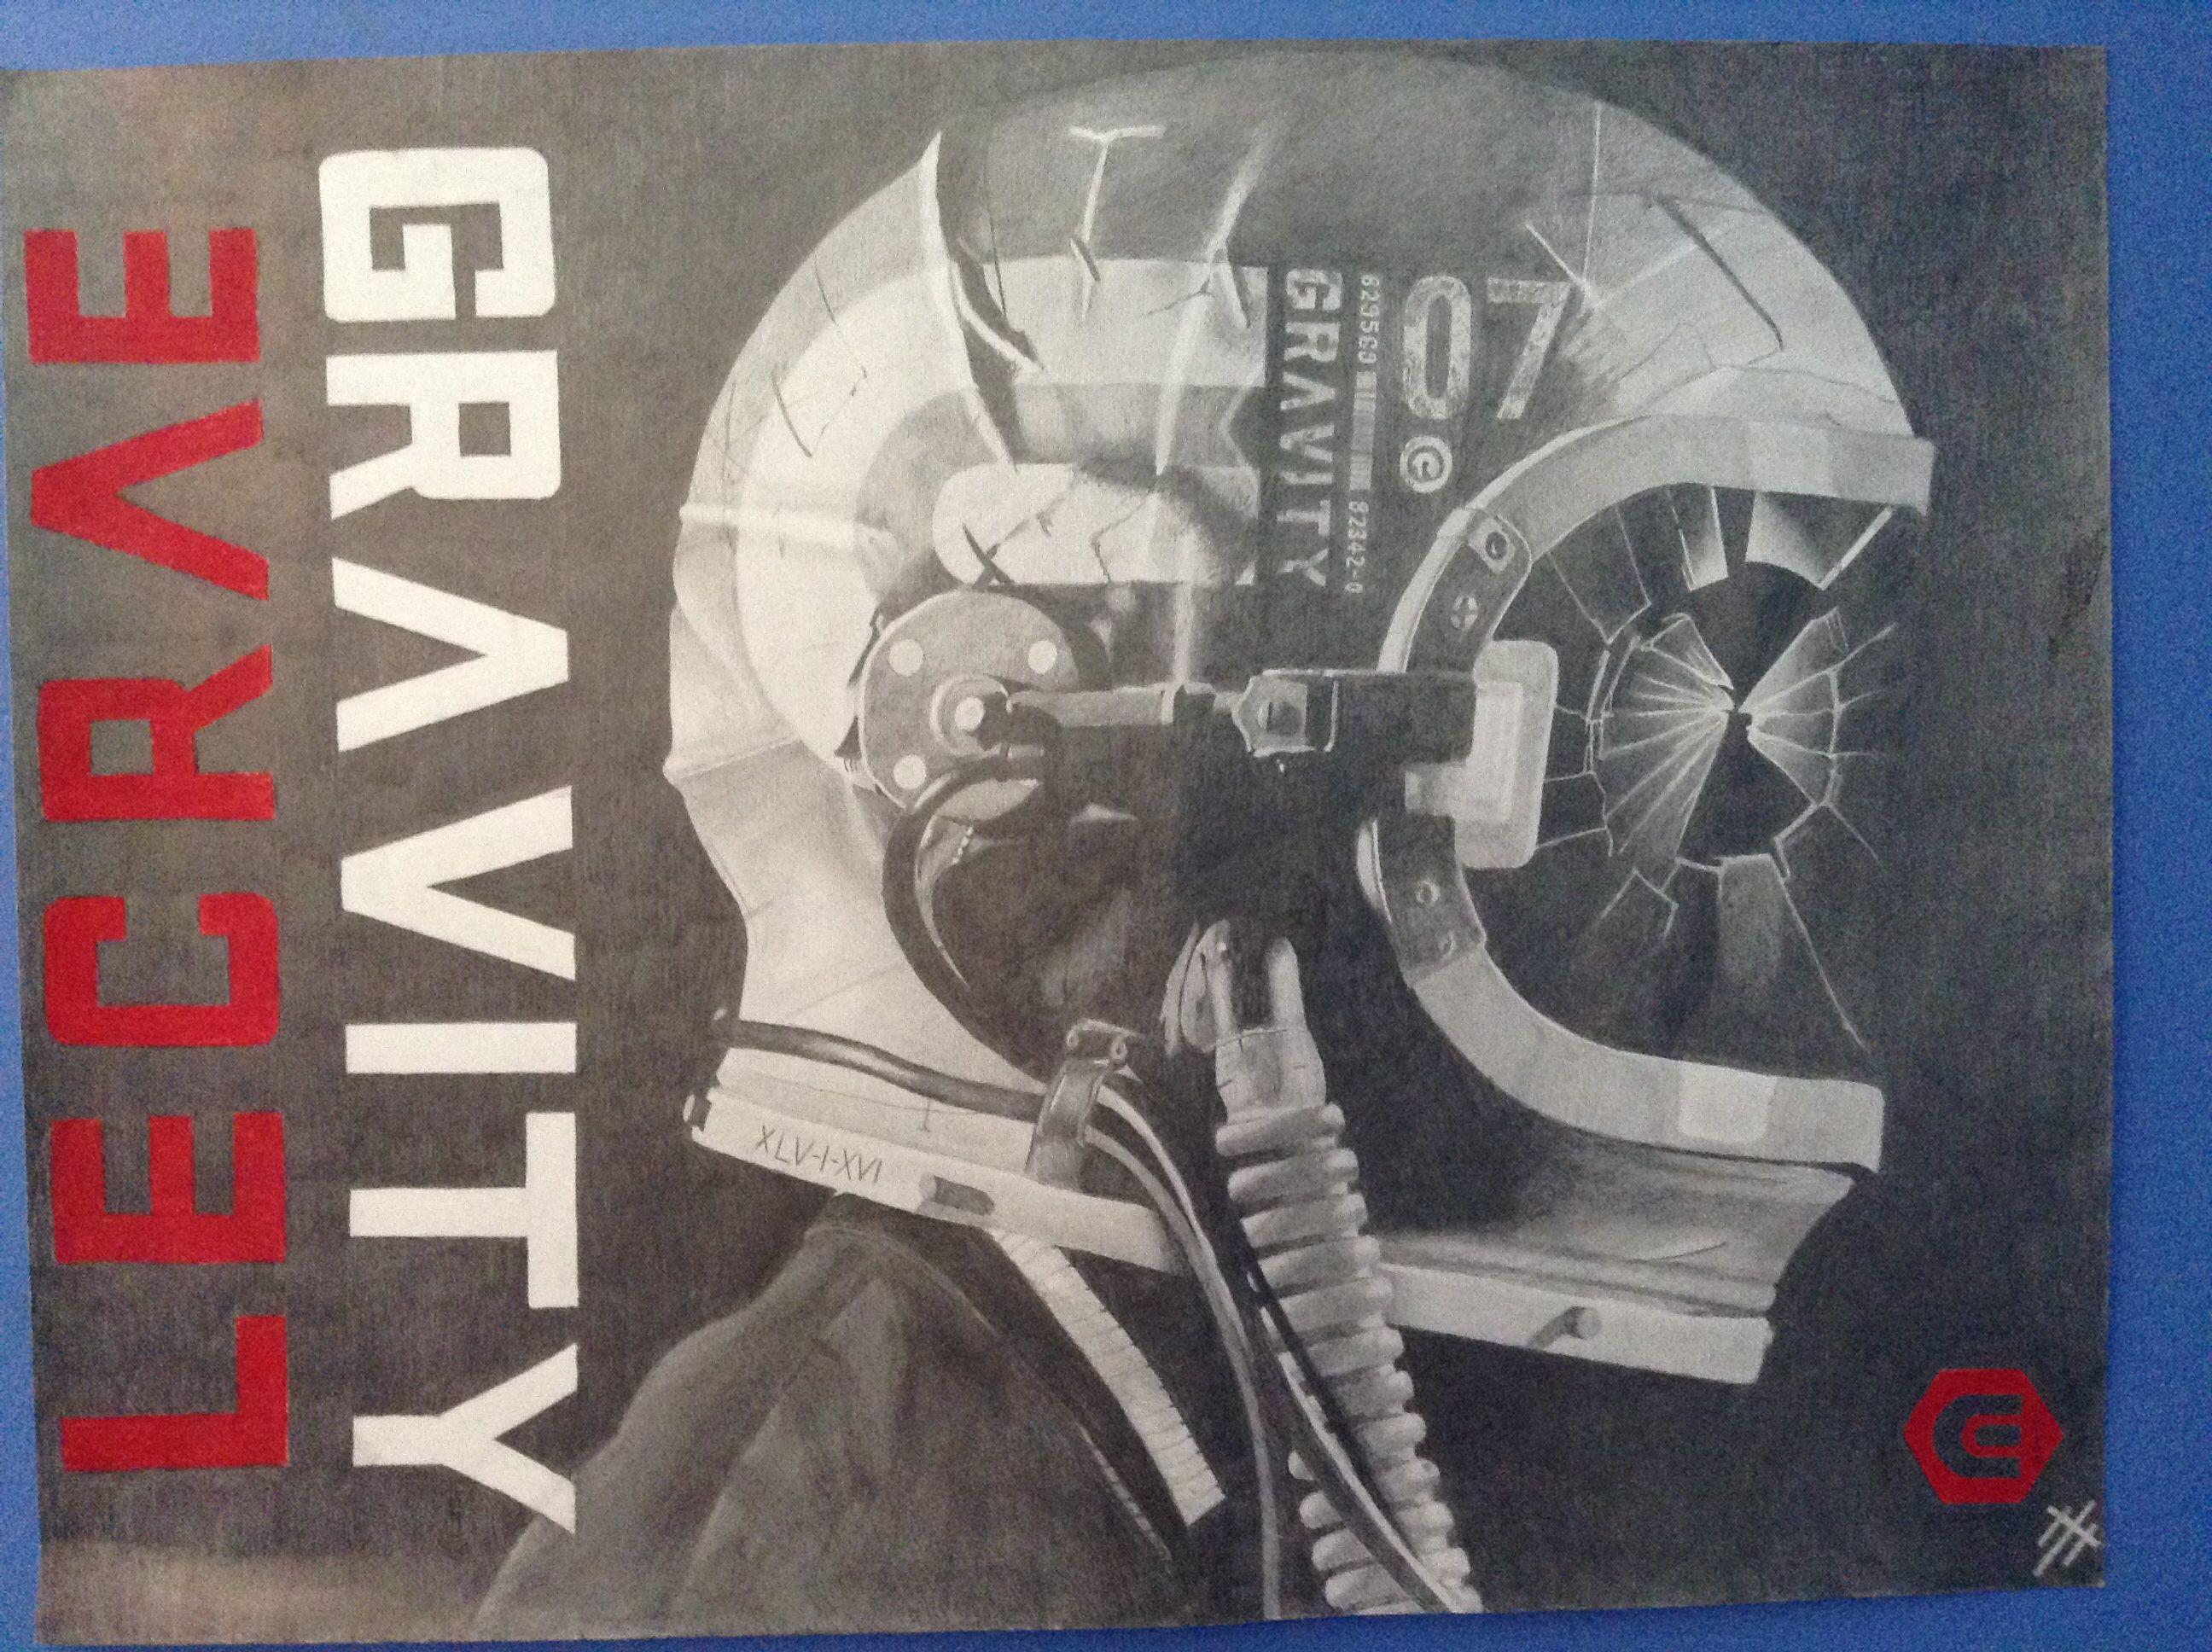 My drawing of Lecrae's Gravity album cover | Lecrae, My ...